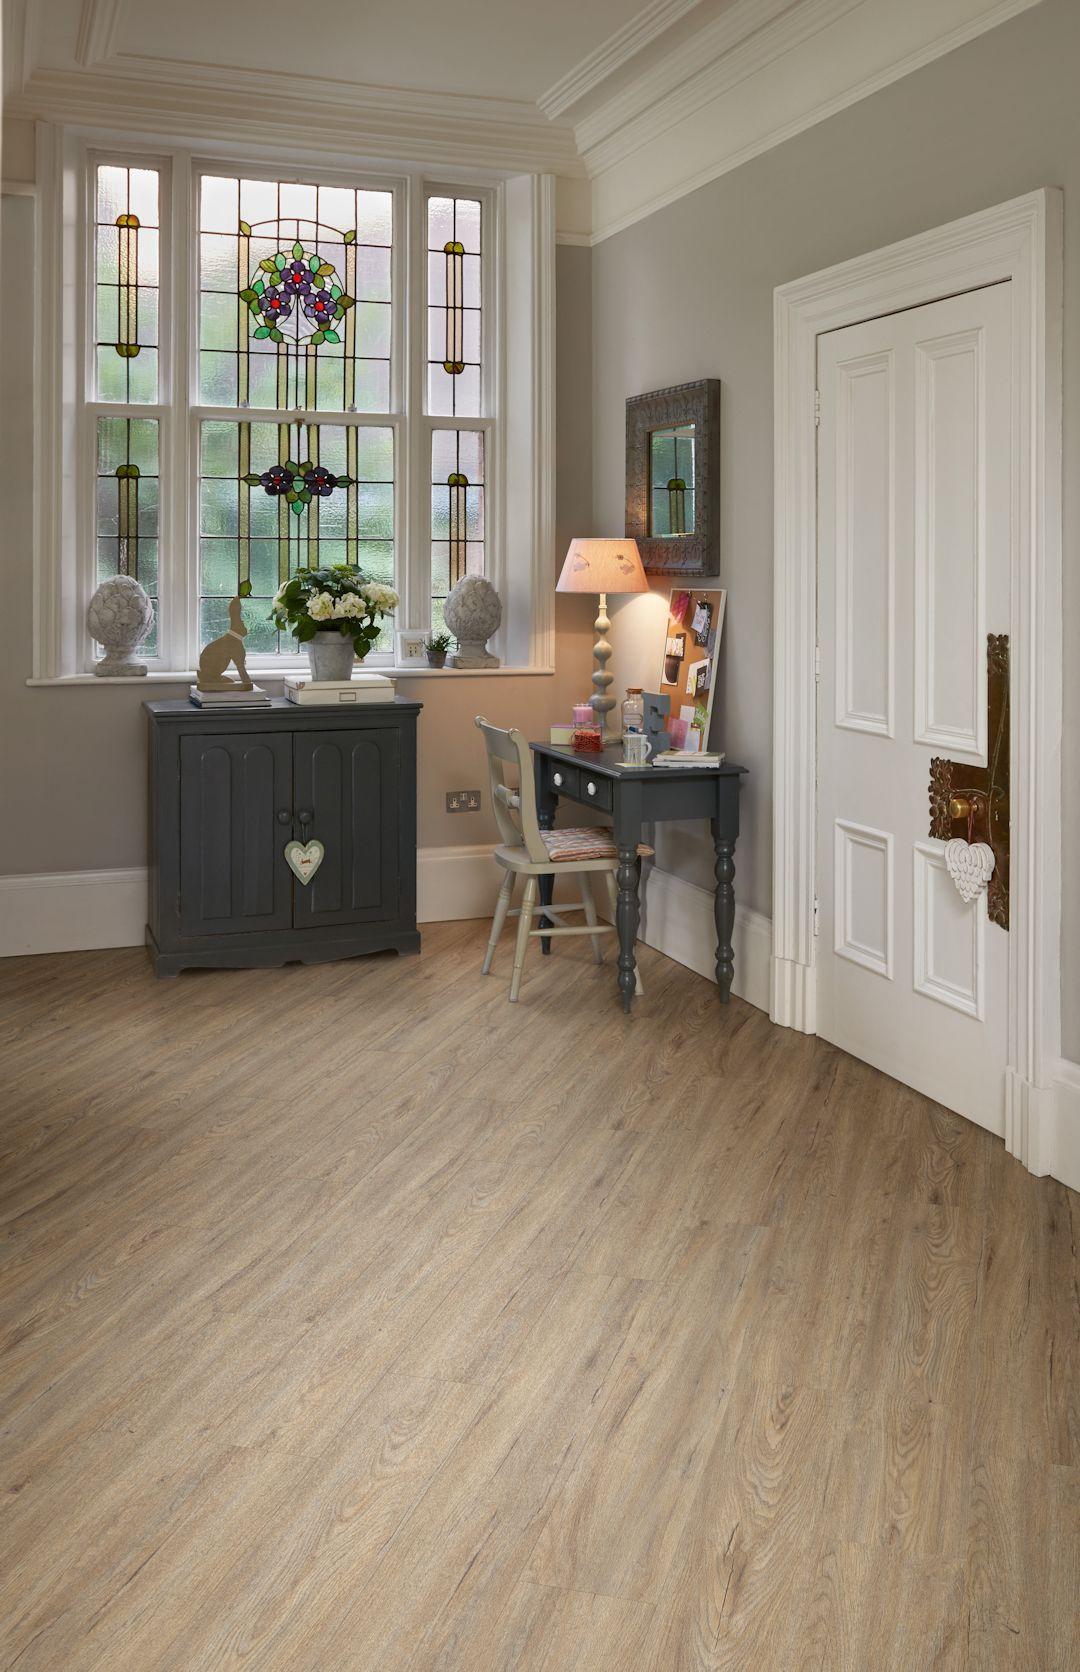 Quayside oak camaro luxury vinyl tile flooring featured in hallway quayside oak camaro luxury vinyl tile flooring featured in hallway dailygadgetfo Image collections